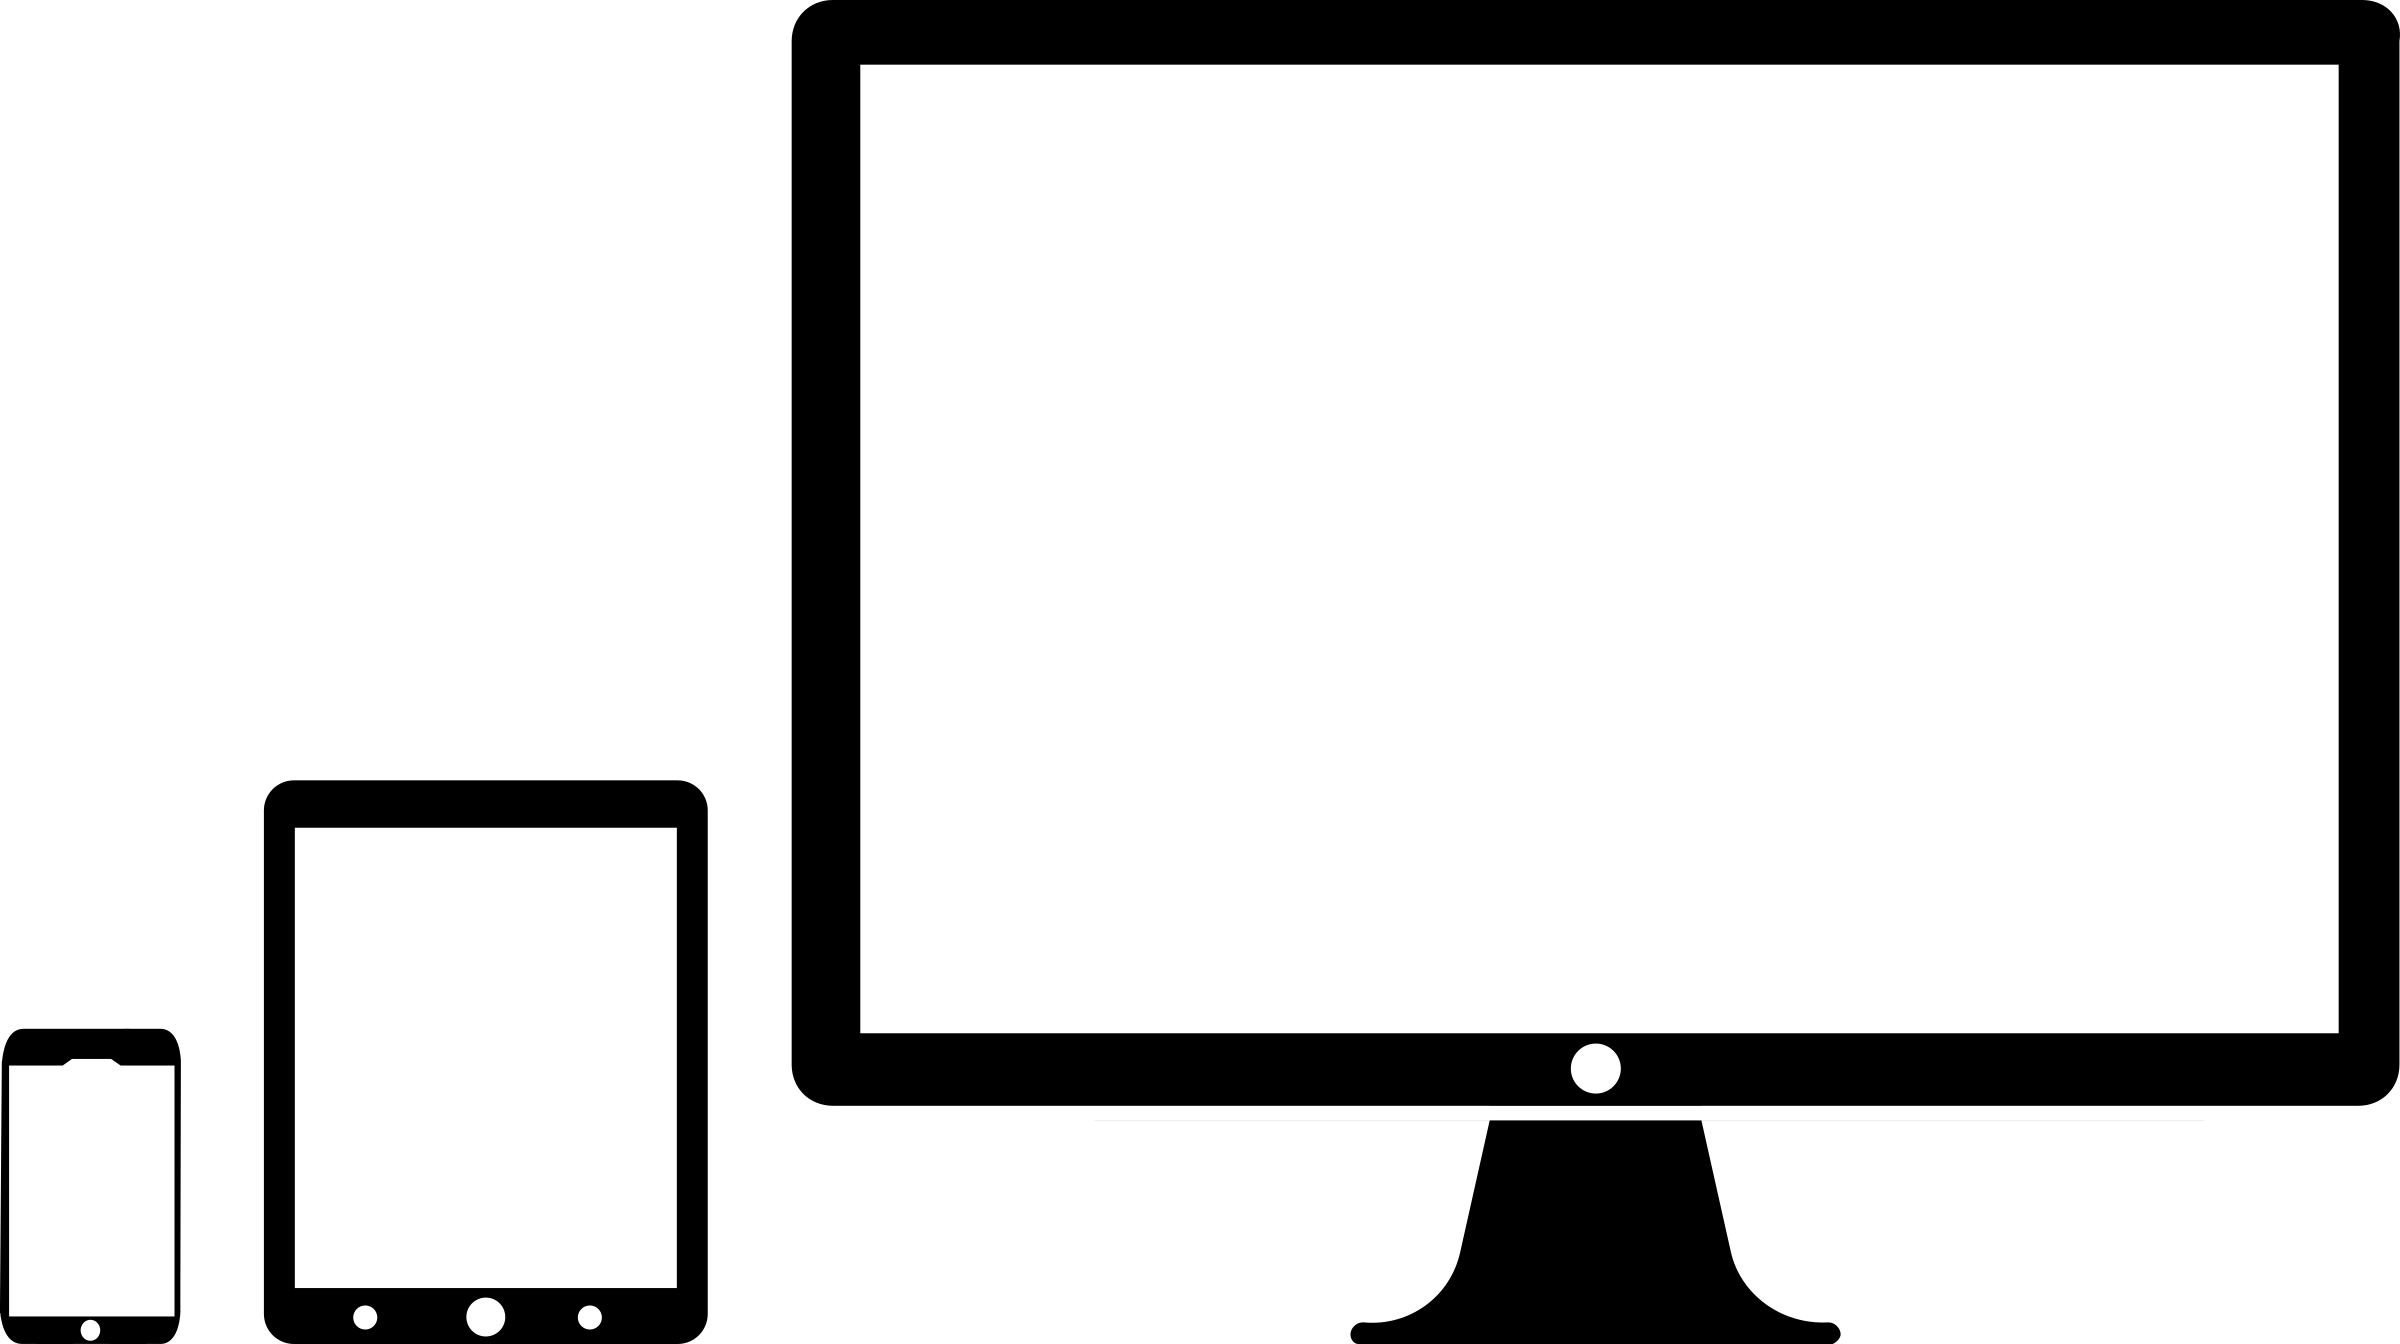 Computer Monitor Clipart.